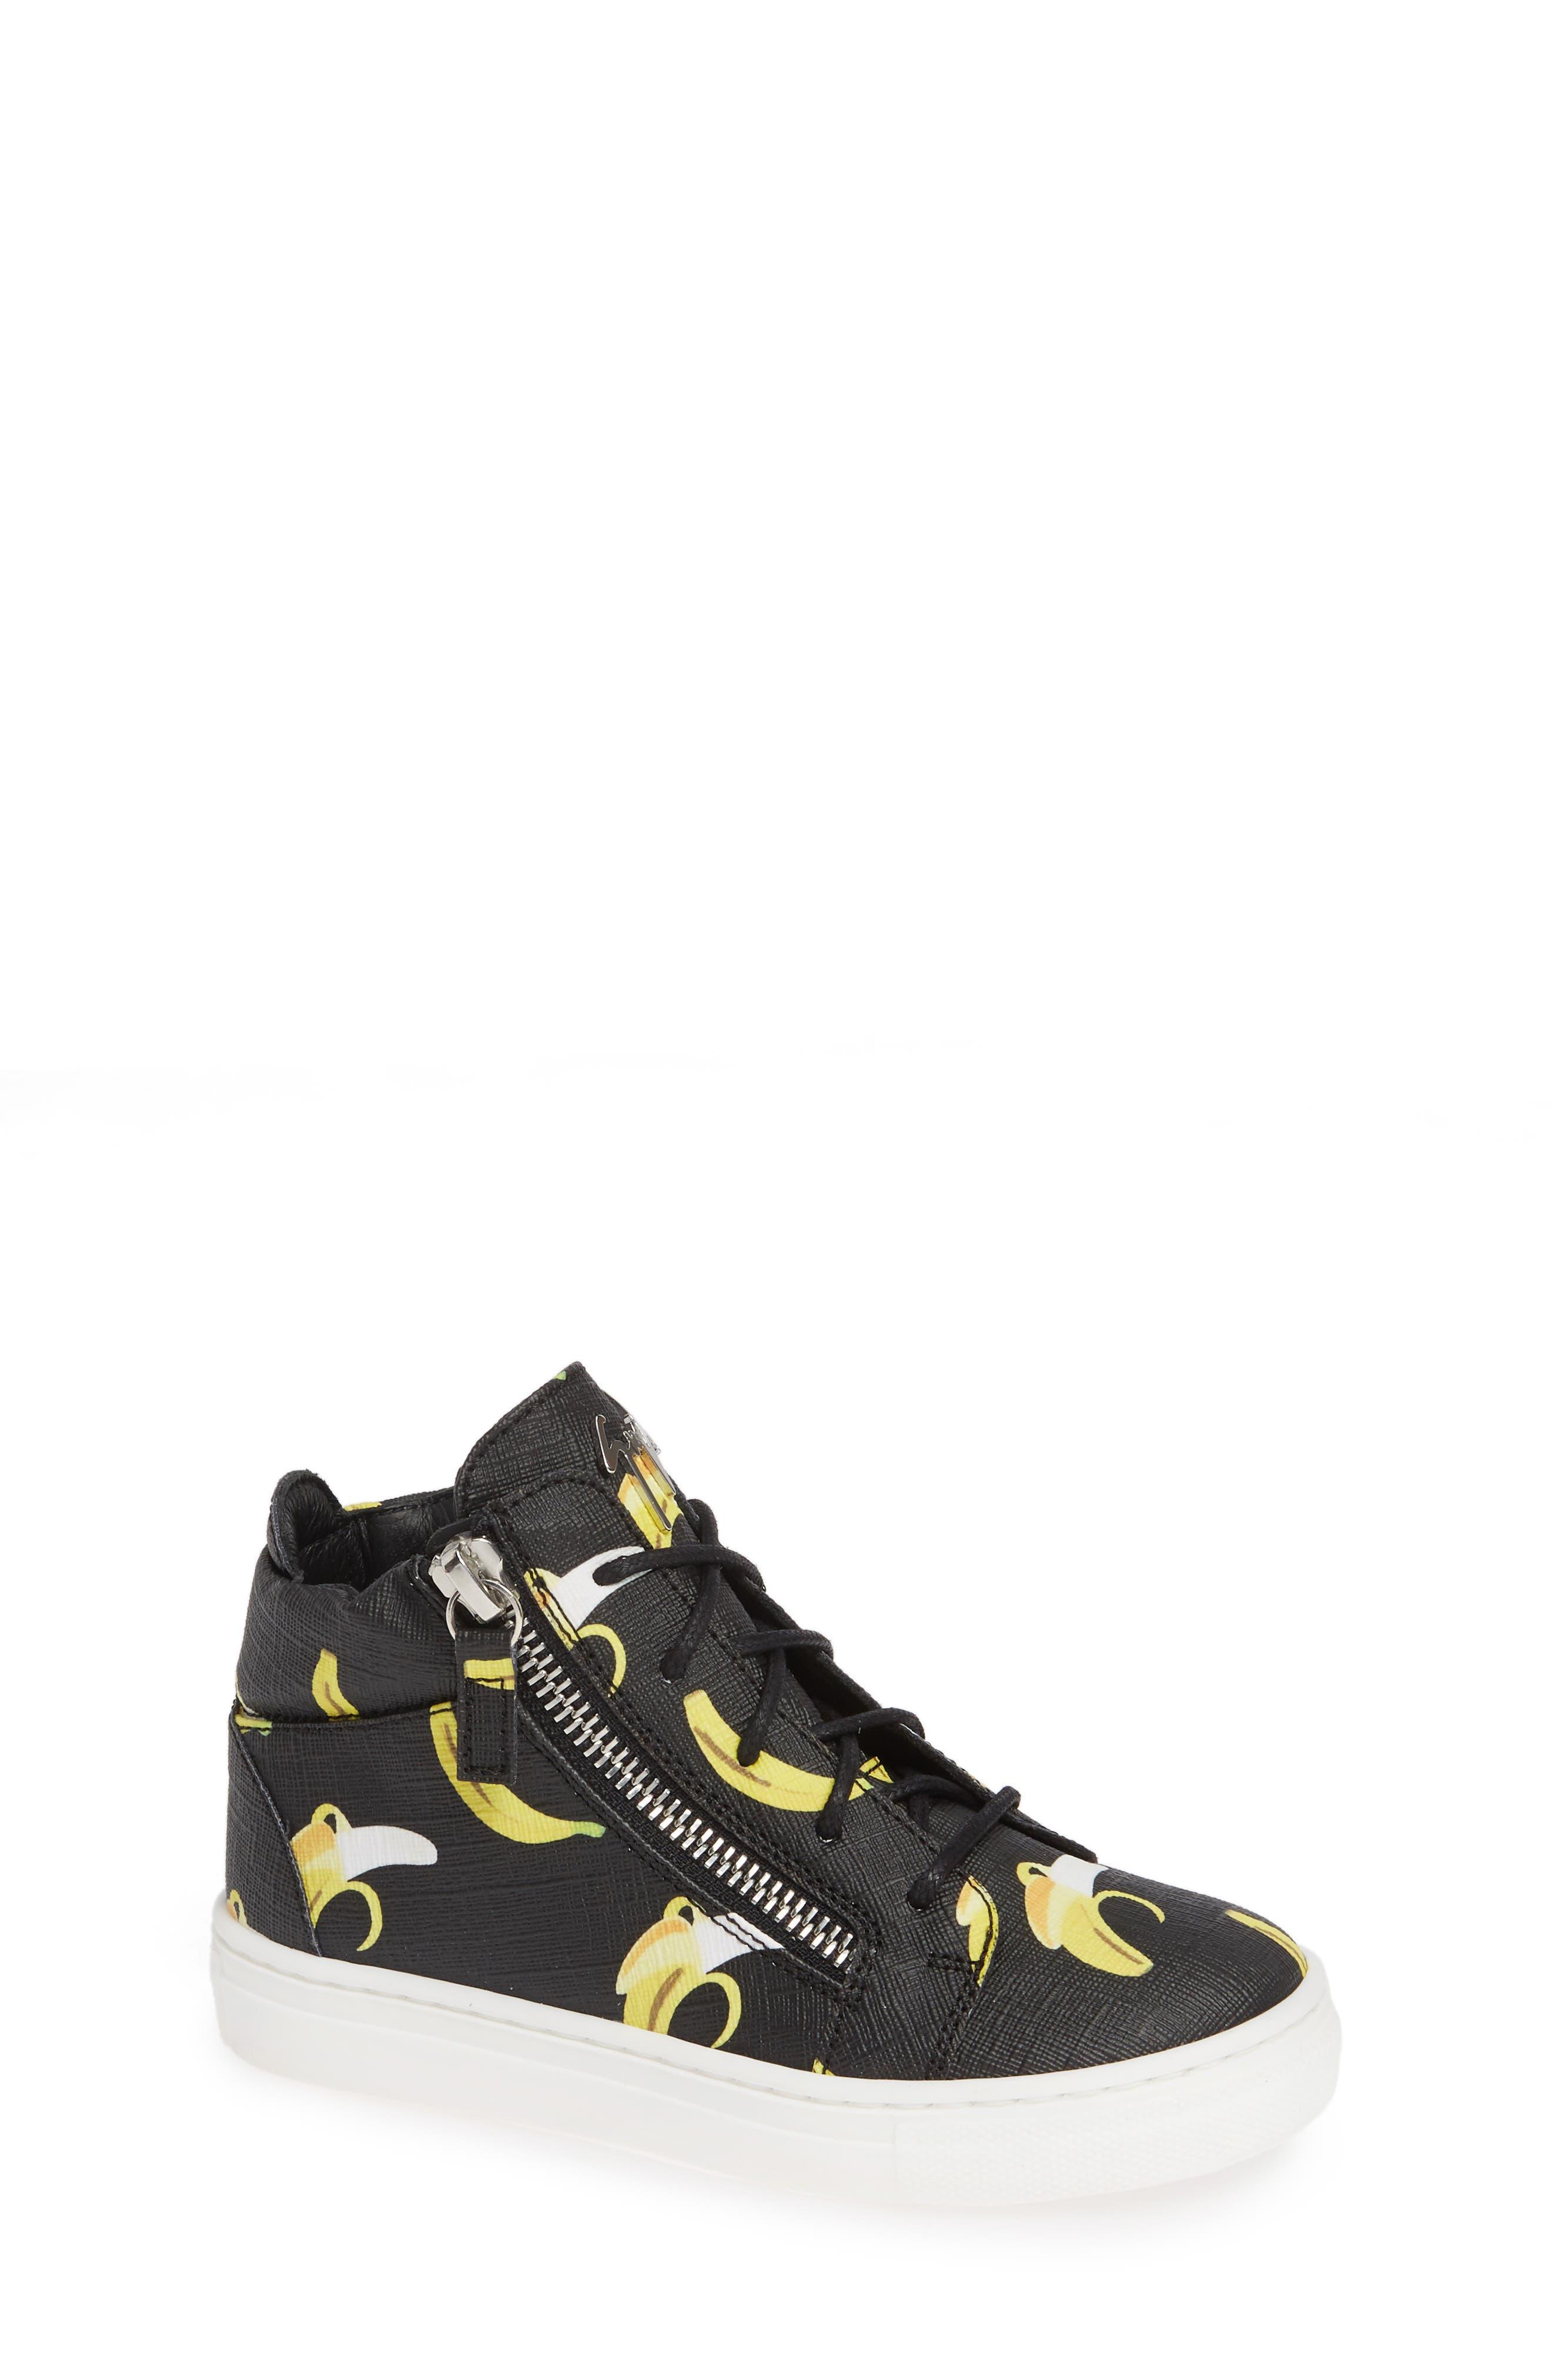 GIUSEPPE ZANOTTI, Kidlondon Banana Print Sneaker, Main thumbnail 1, color, BANANAS